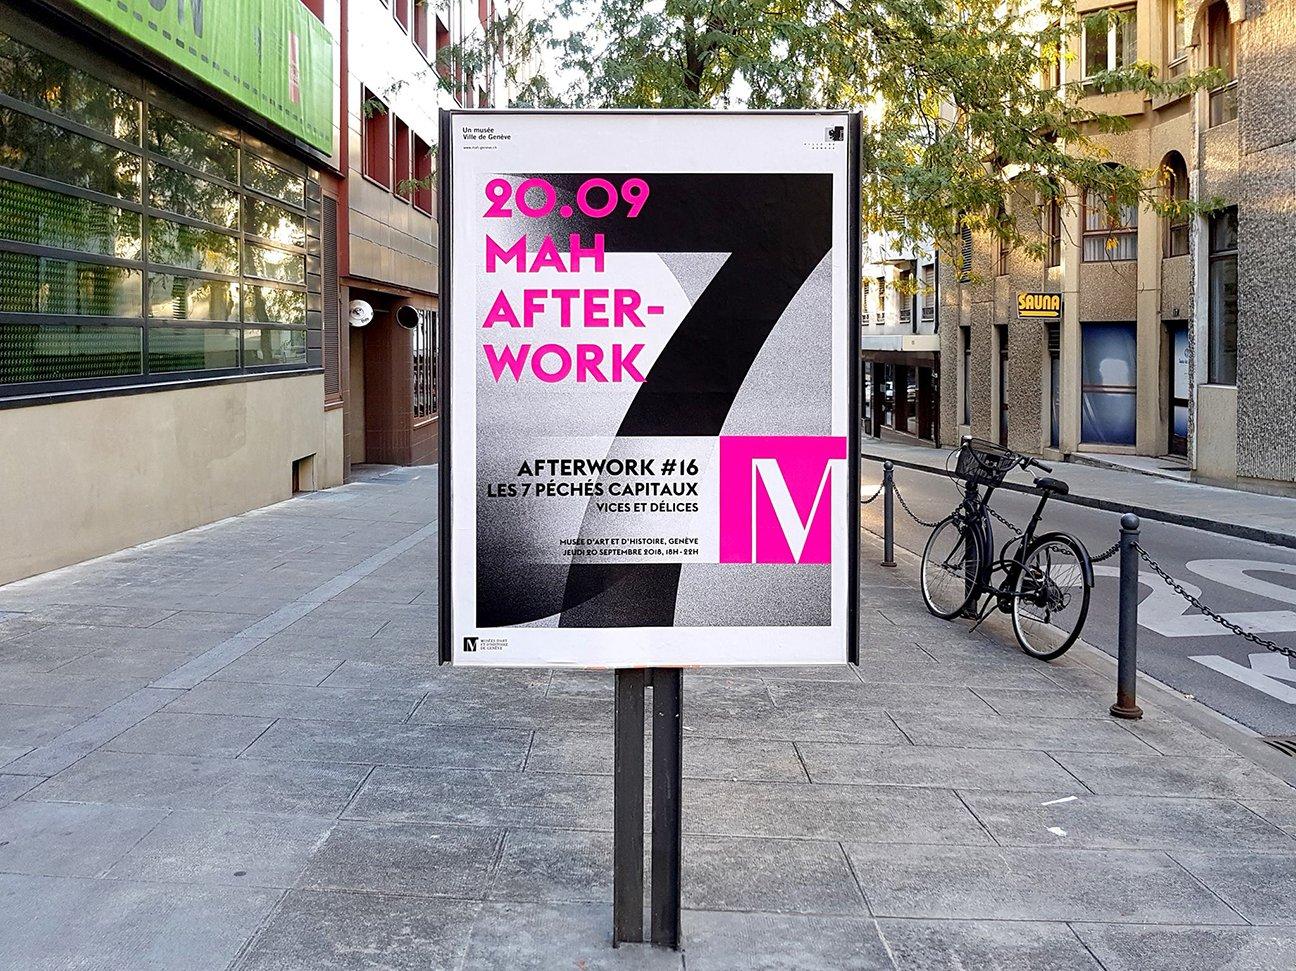 Fabien_cuffel_graphisme_typo_affiche_MAH_AFTERWORK_geneve-musee